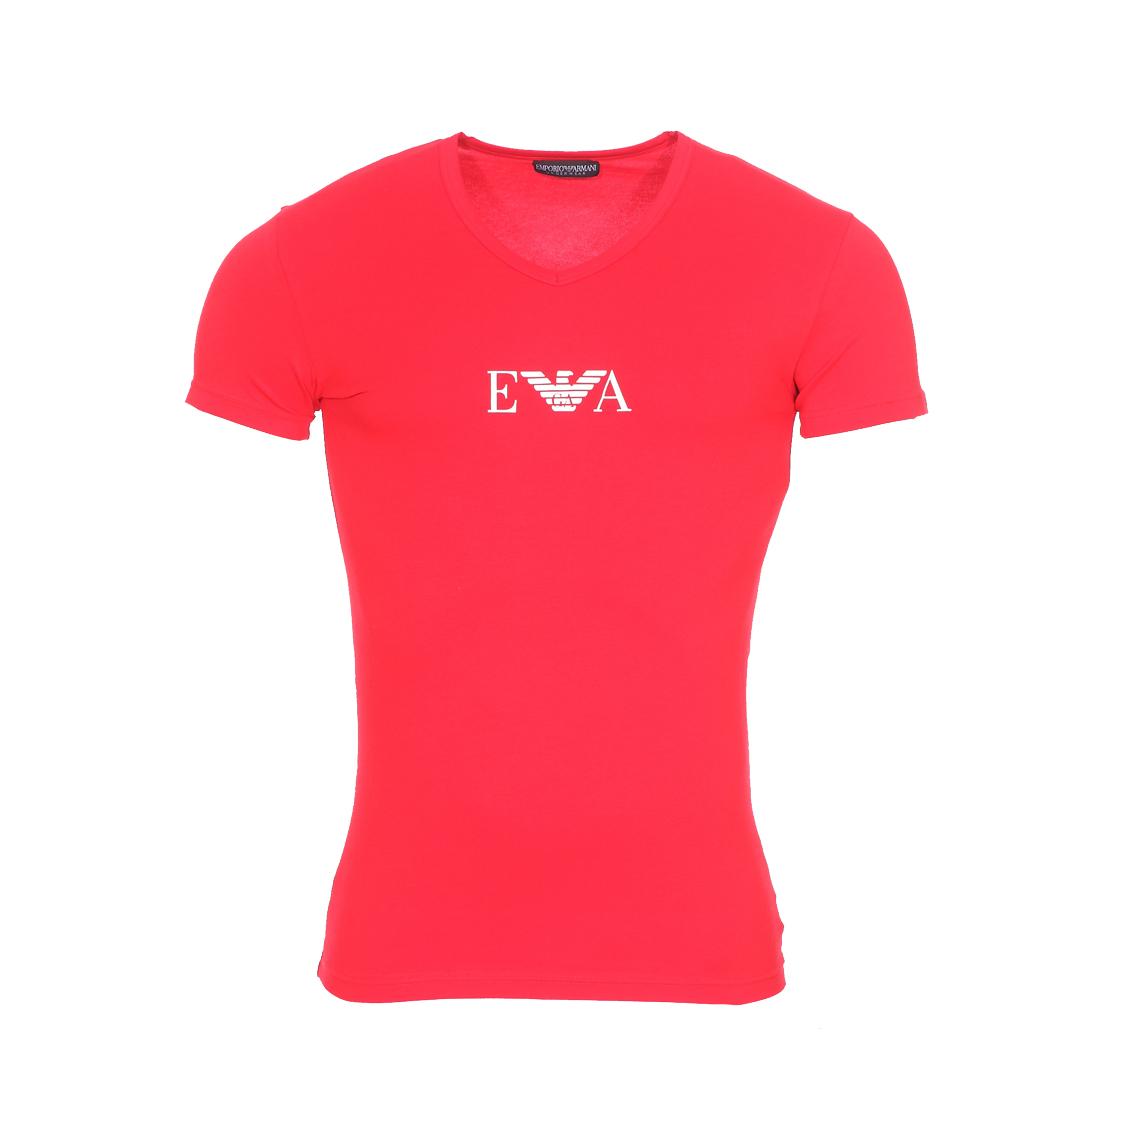 Tee-shirt col v  en coton stretch rouge floqué en blanc